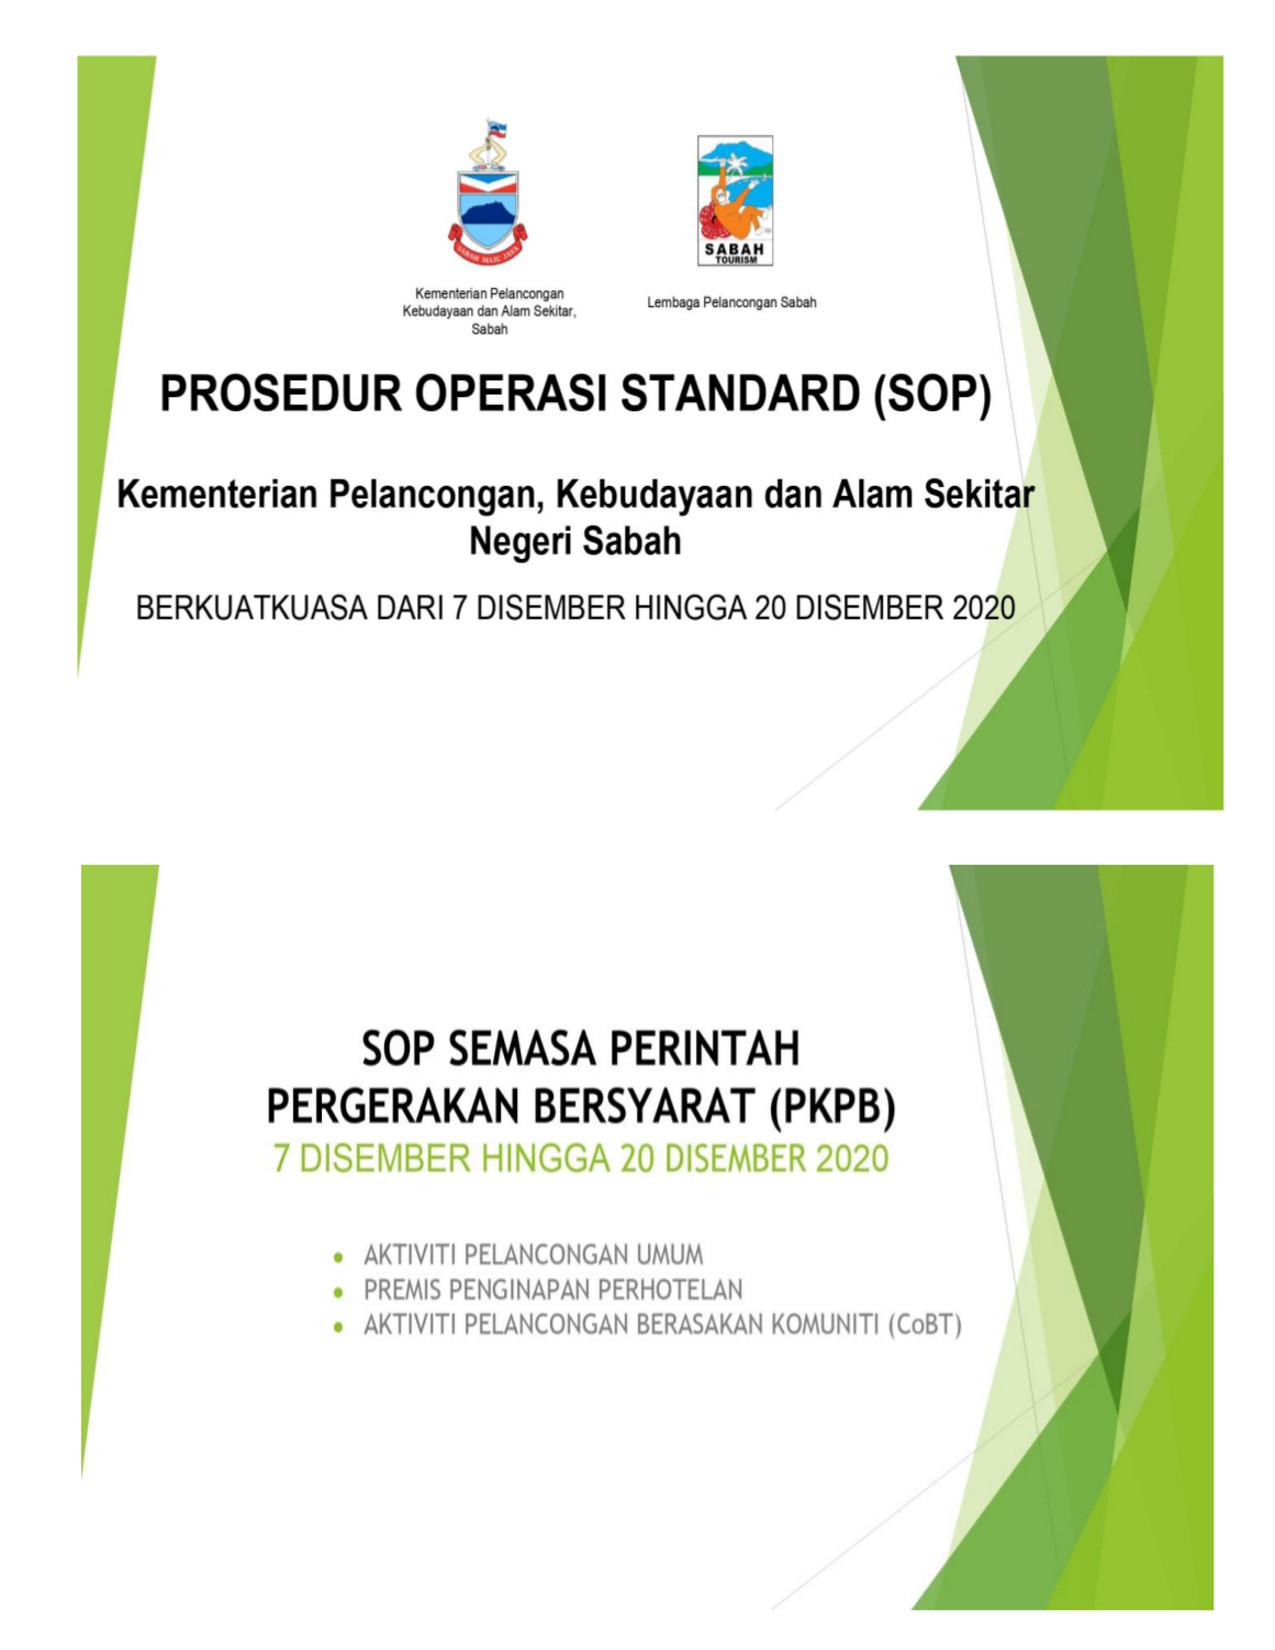 Prosedur Operasi Standard (SOP)